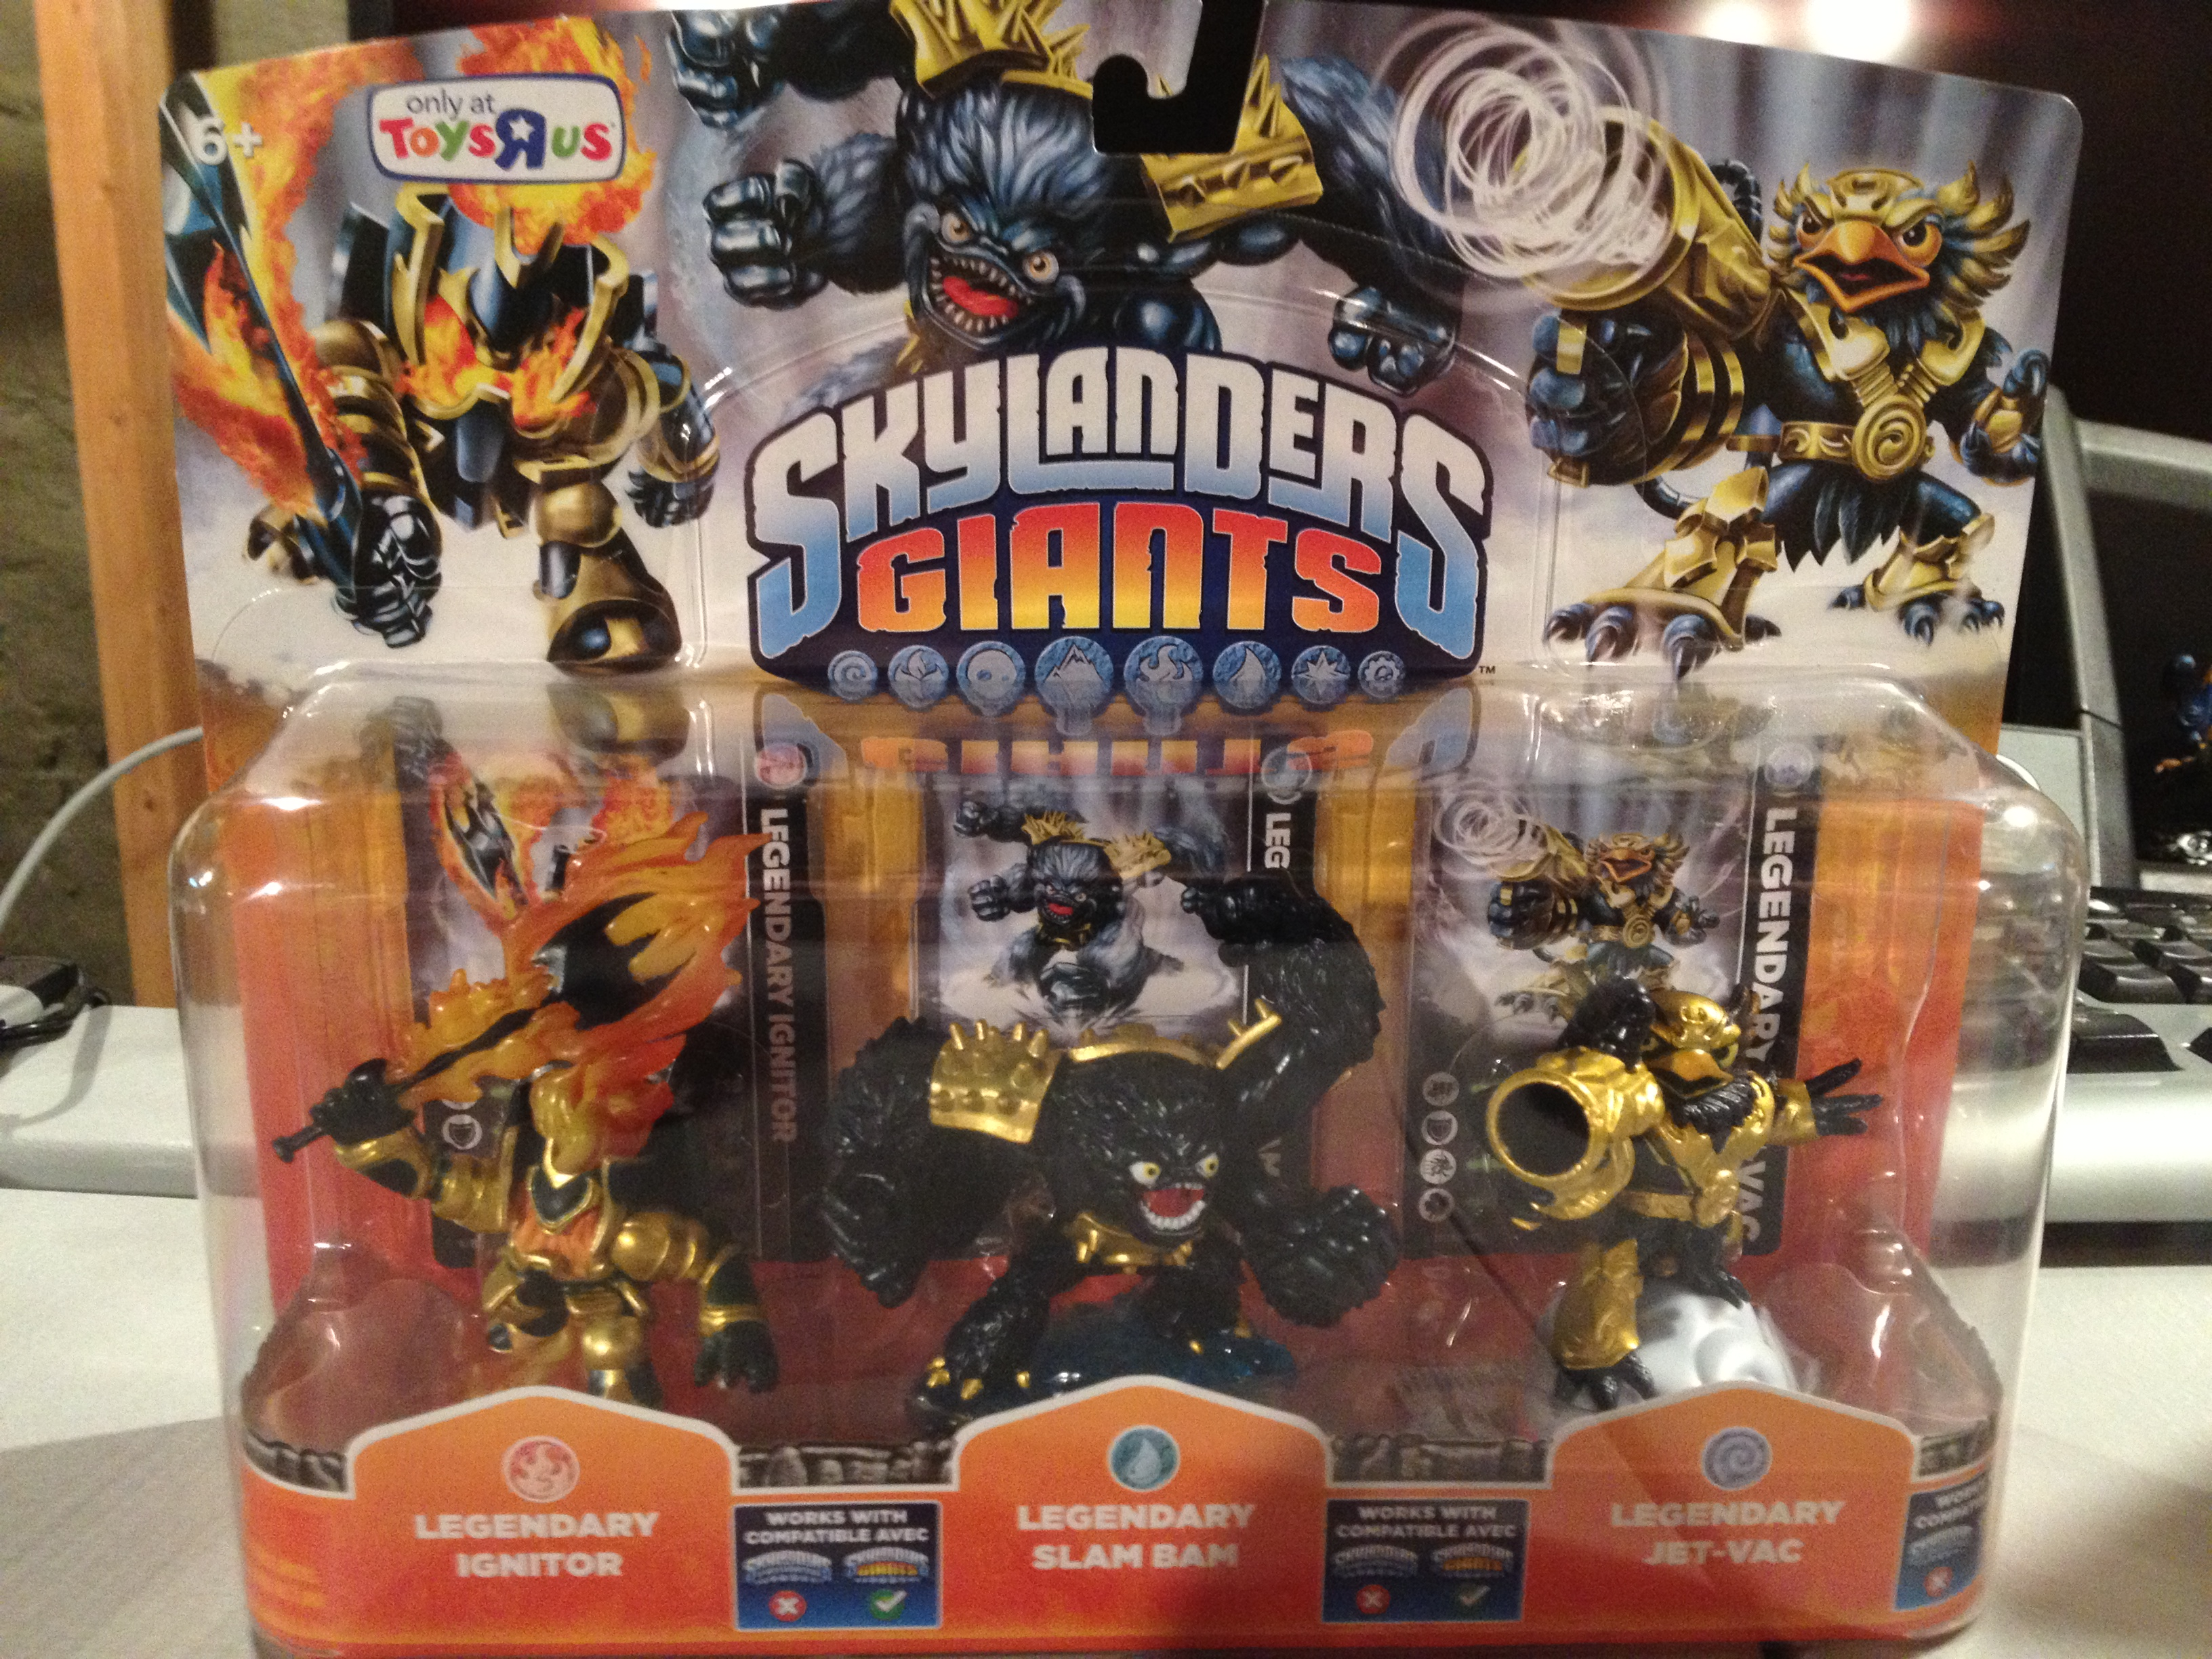 Legendary Skylanders Giants Figures - Slam Bam, Jet Vac and Ignitor